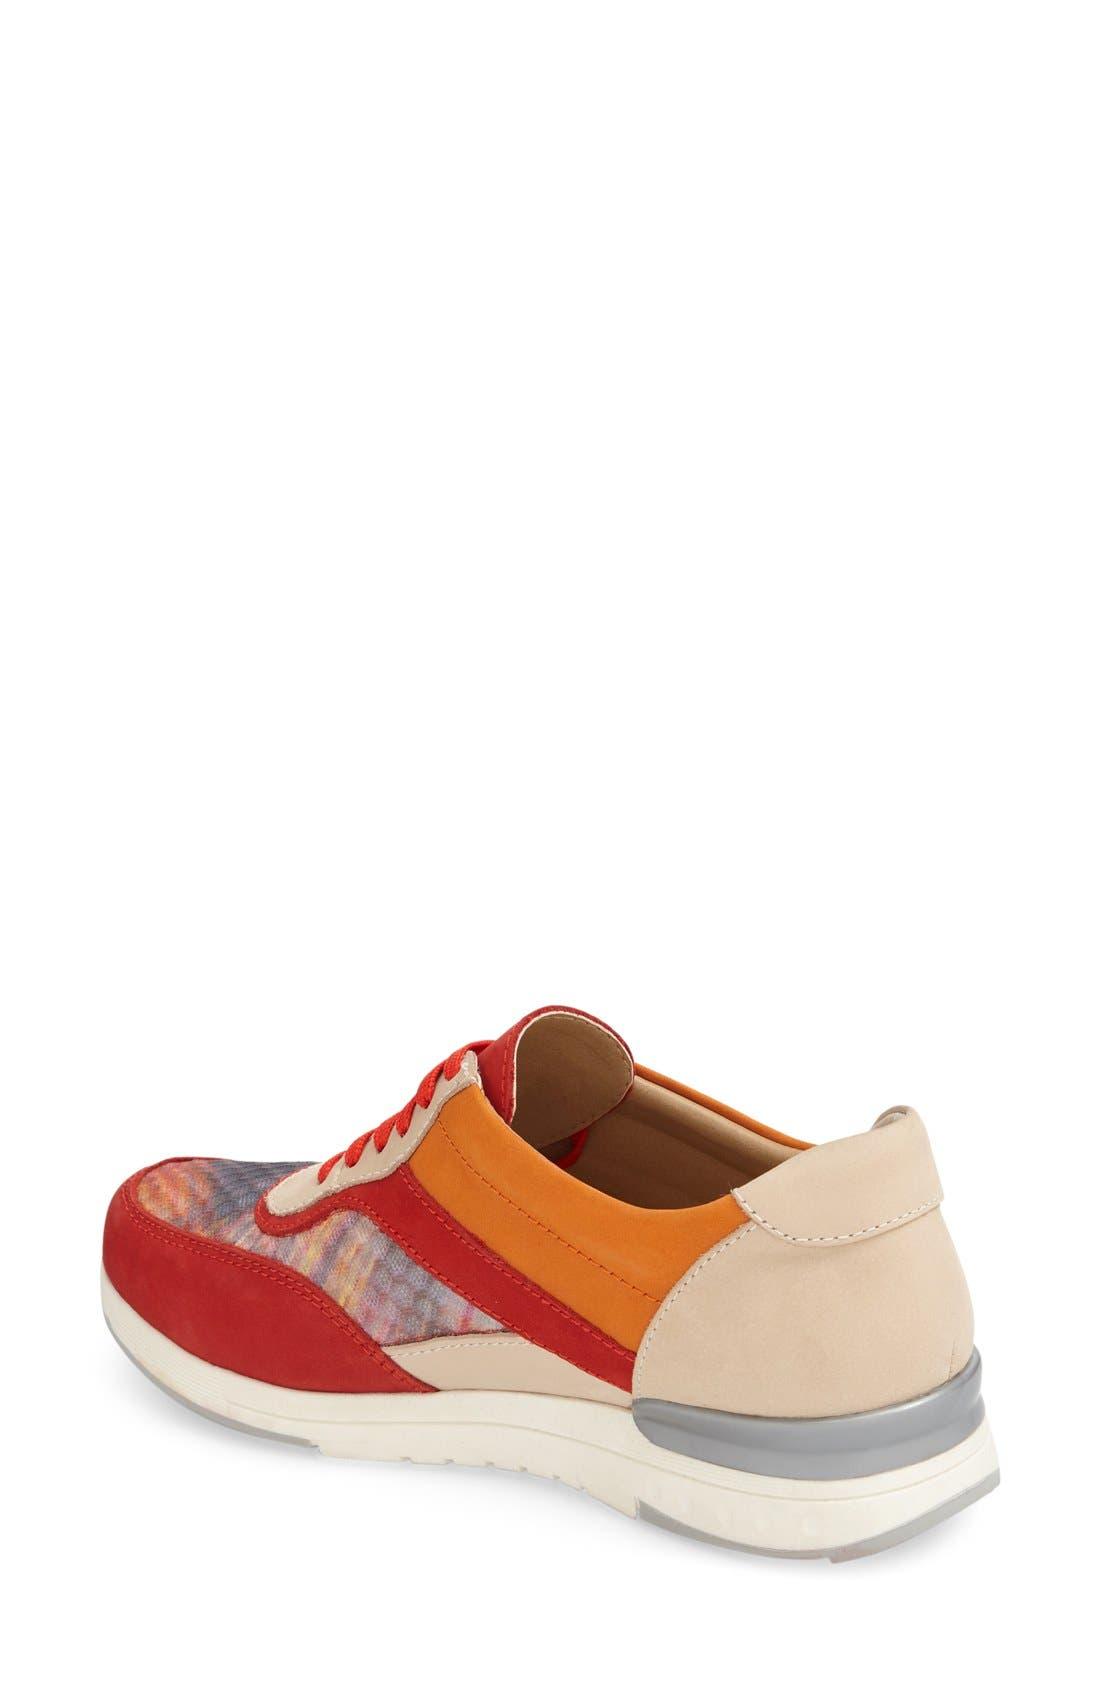 Alternate Image 4  - VANELi 'Pride' Sneaker (Women)